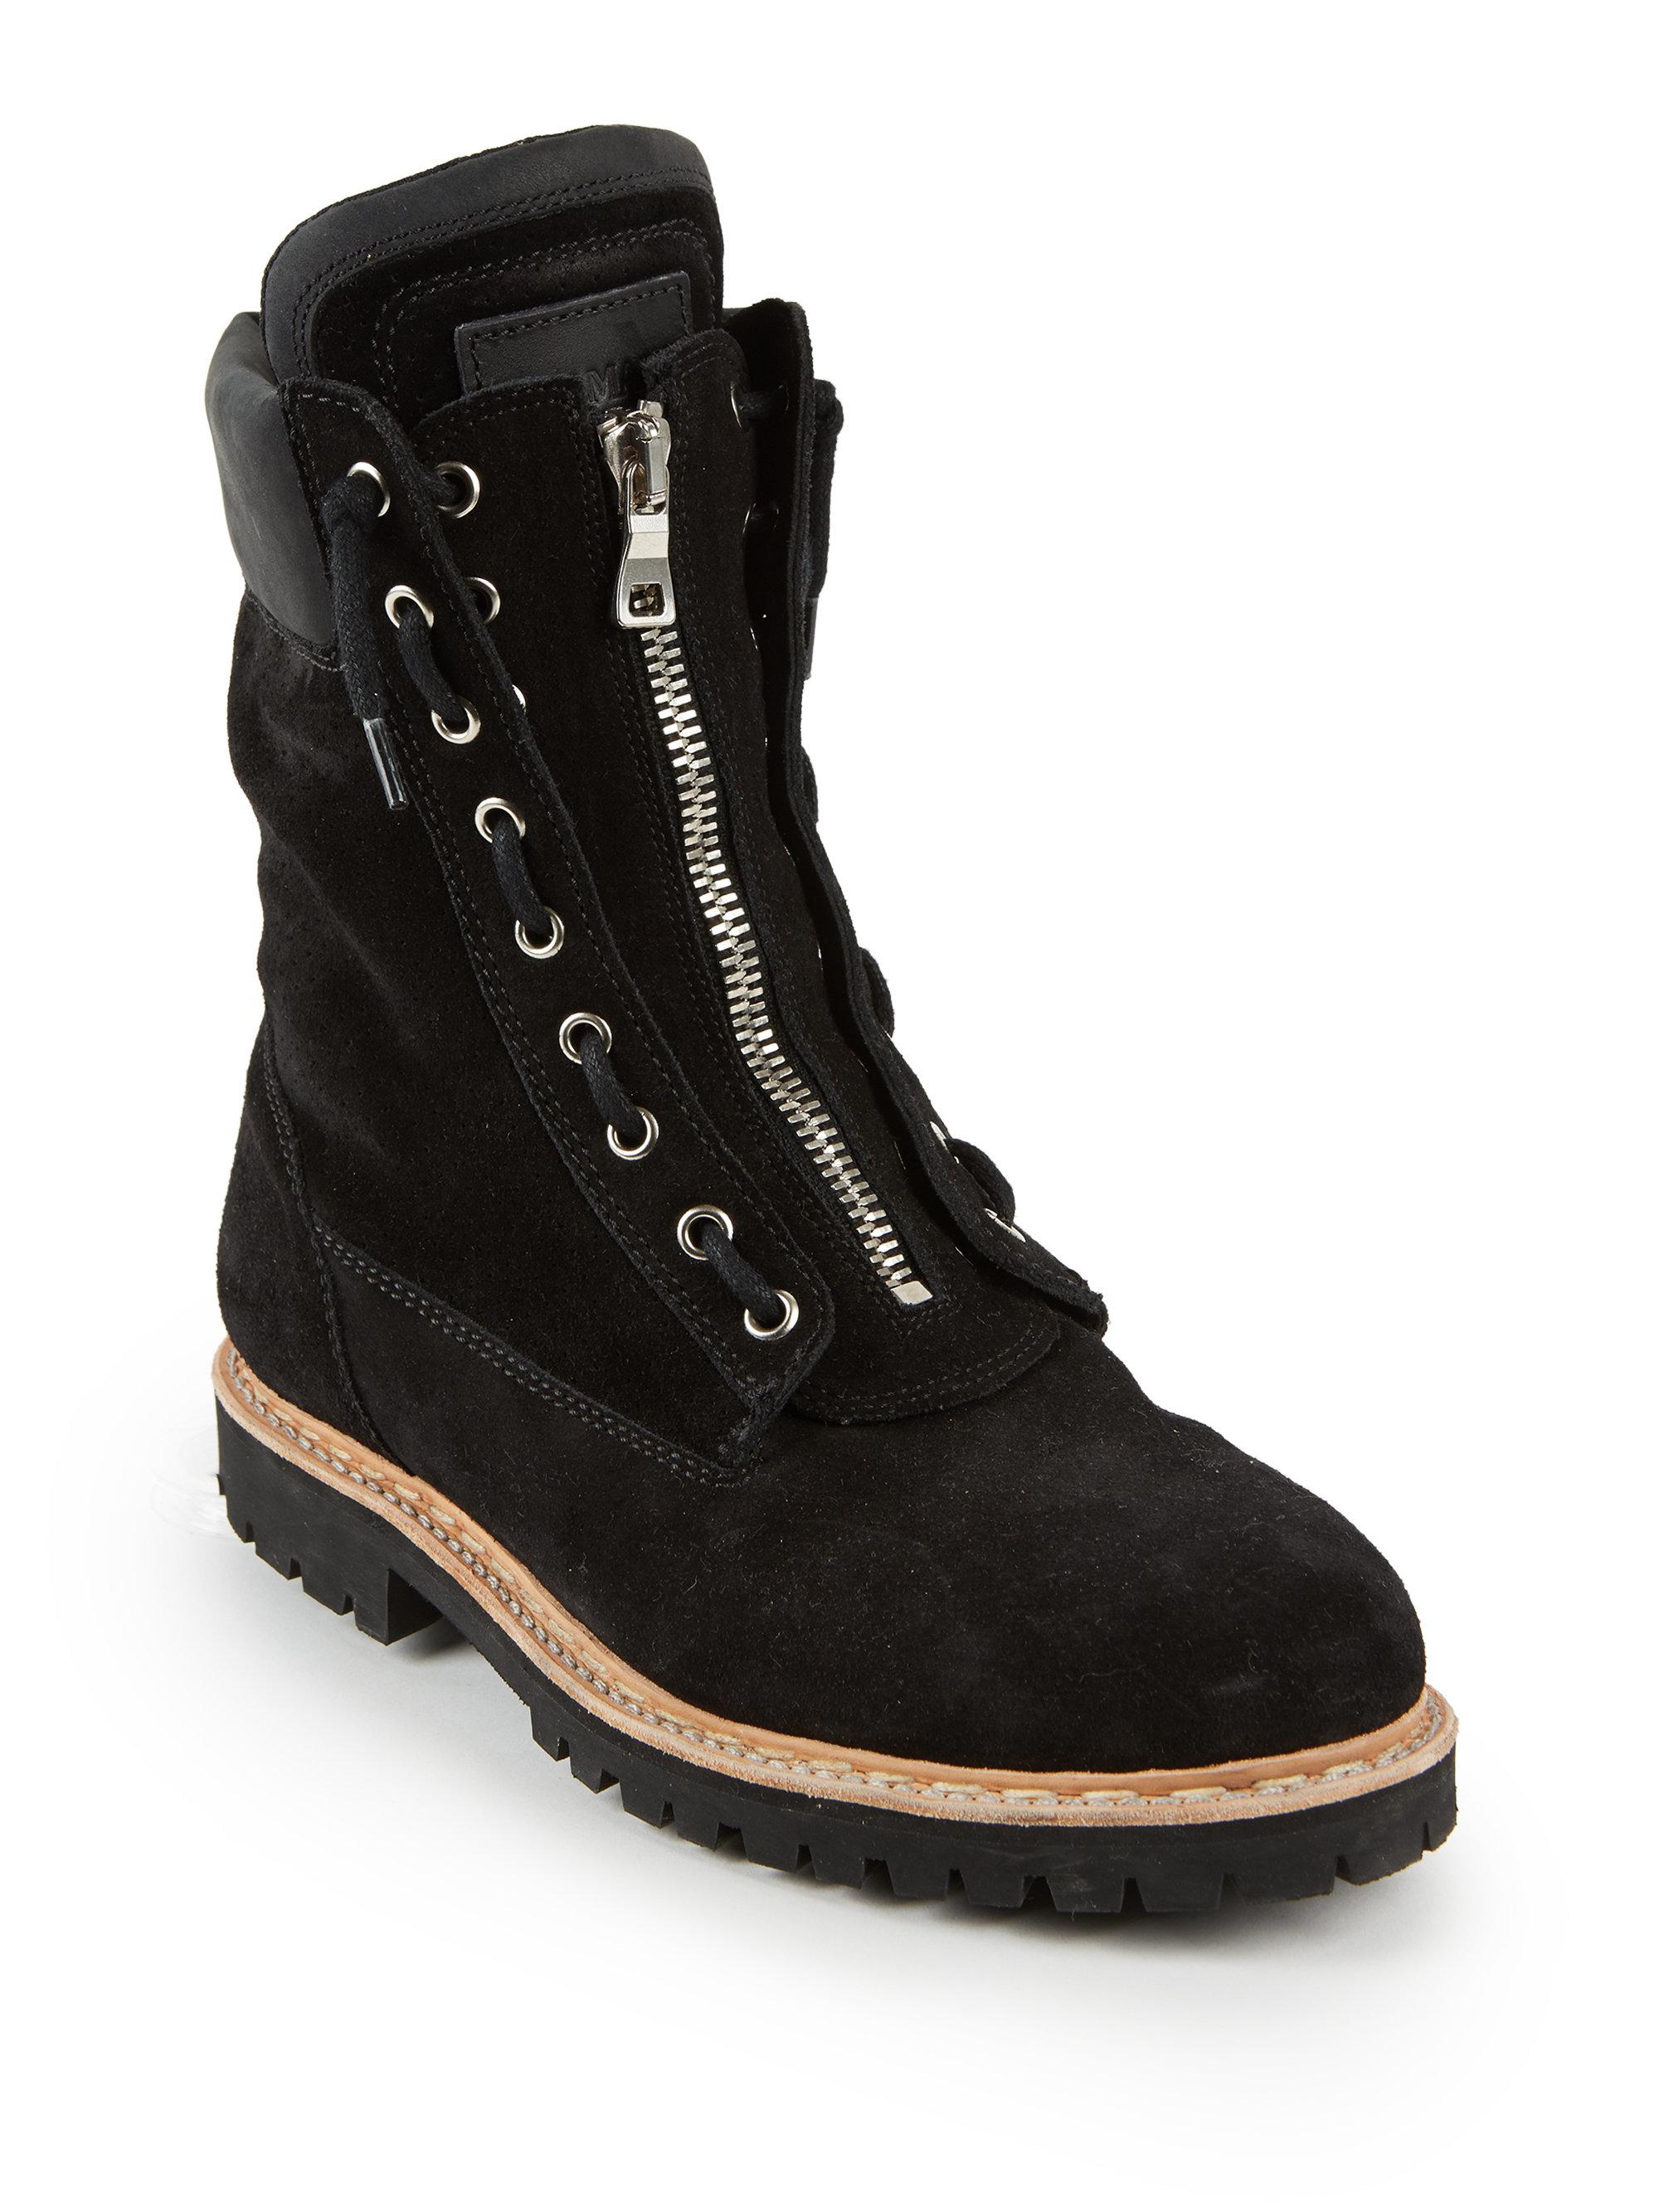 Black Zip Ties >> Balmain Taiga Leather and Velvet Combat Boots in Black for ...